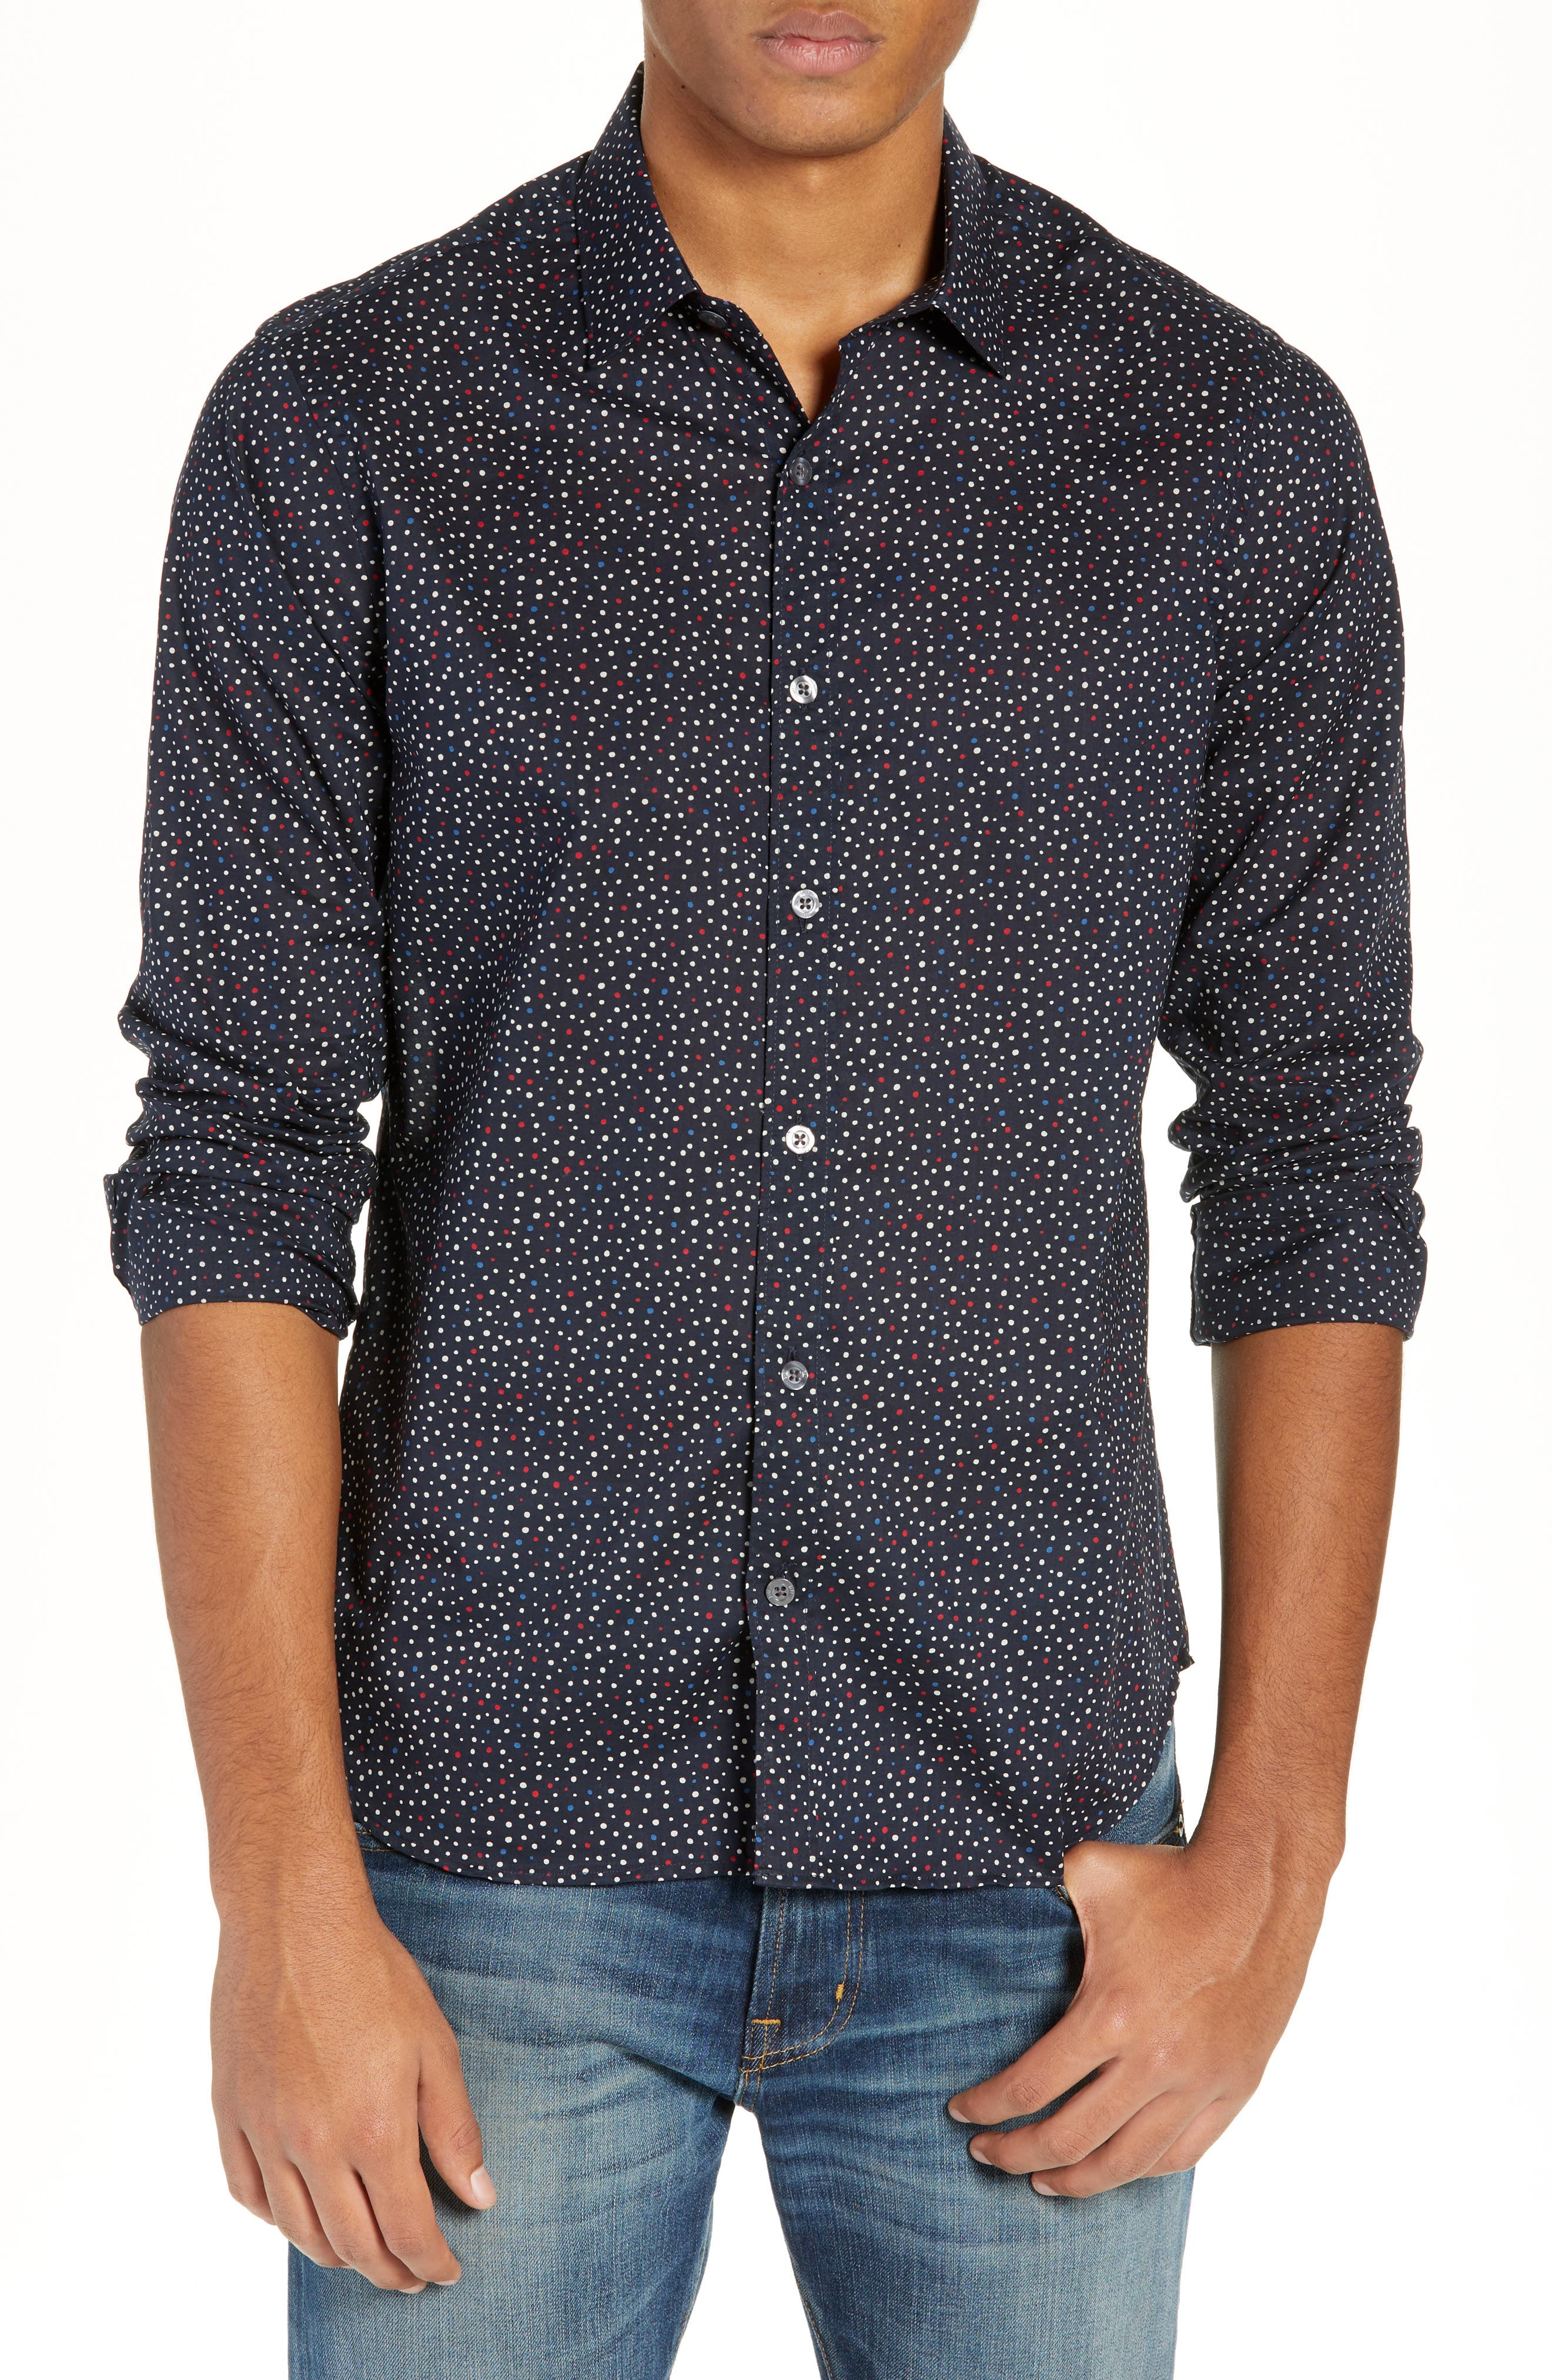 Jenks Slim Fit Long Sleeve Sport Shirt, Main, color, BLACK